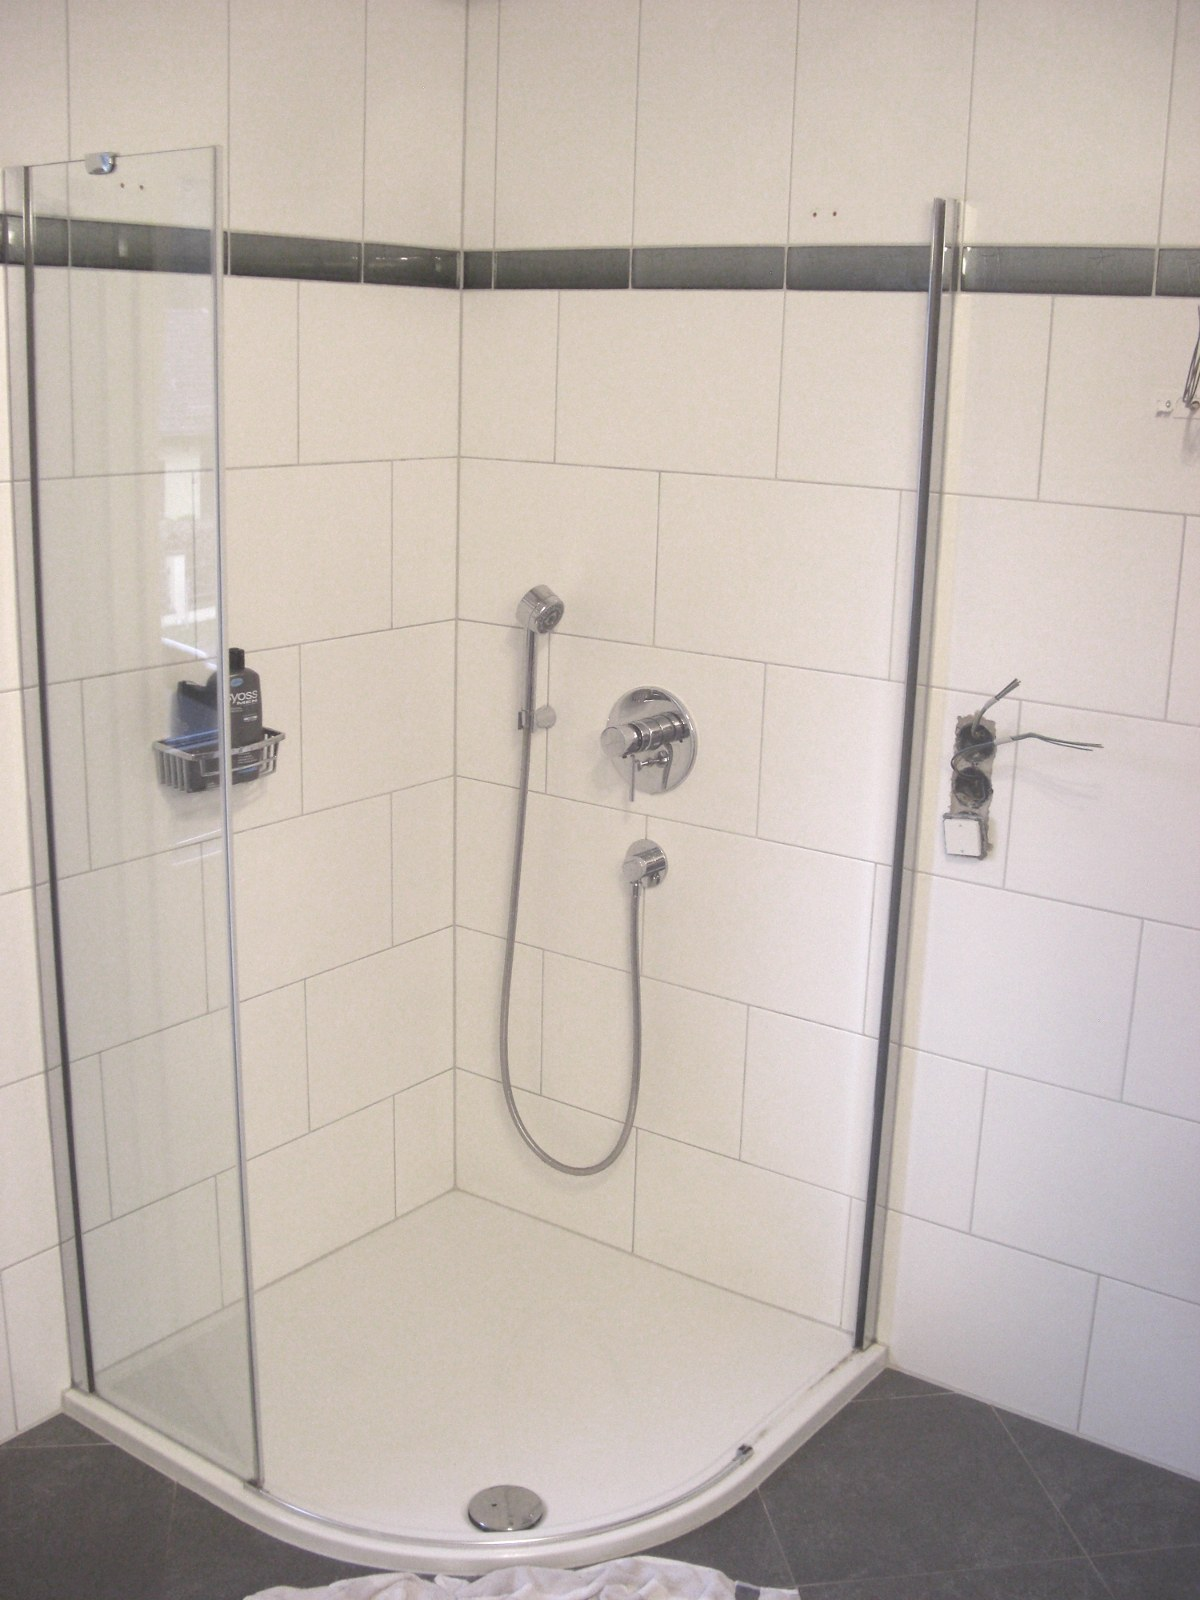 barrierefreie dusche bernd block haustechnik. Black Bedroom Furniture Sets. Home Design Ideas